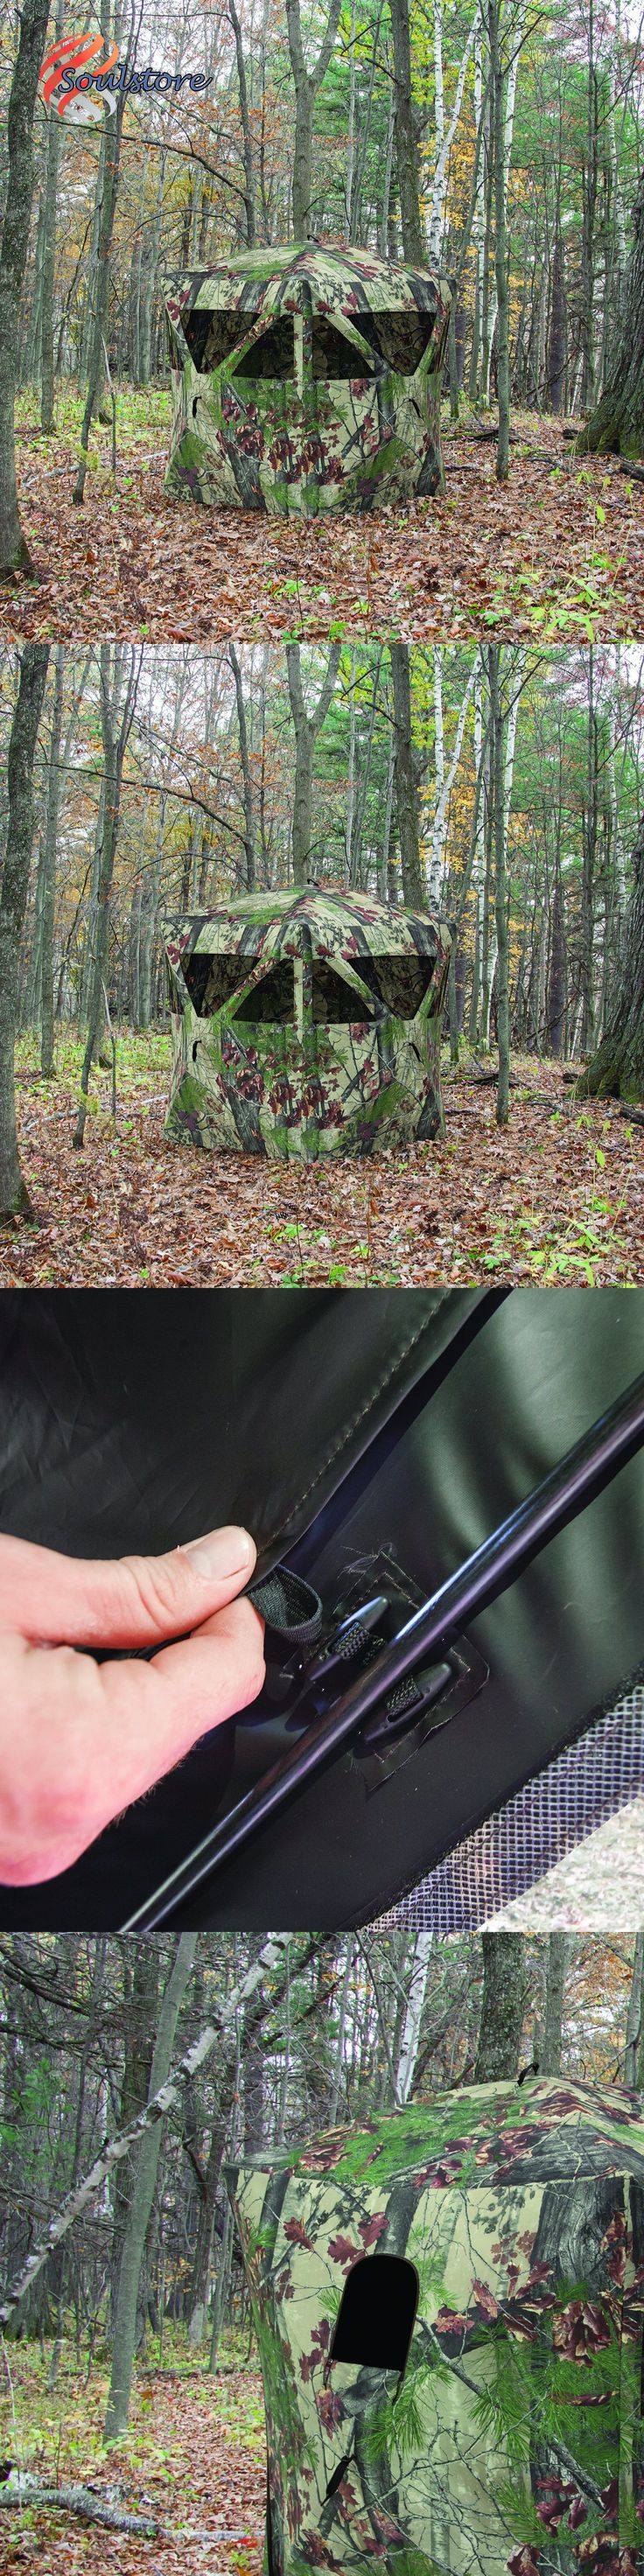 Blinds 177910: Radar Hunting Ground Blind Bloodtrail Backwoods Camo Hunting Deer Game Turkey -> BUY IT NOW ONLY: $111.98 on eBay!